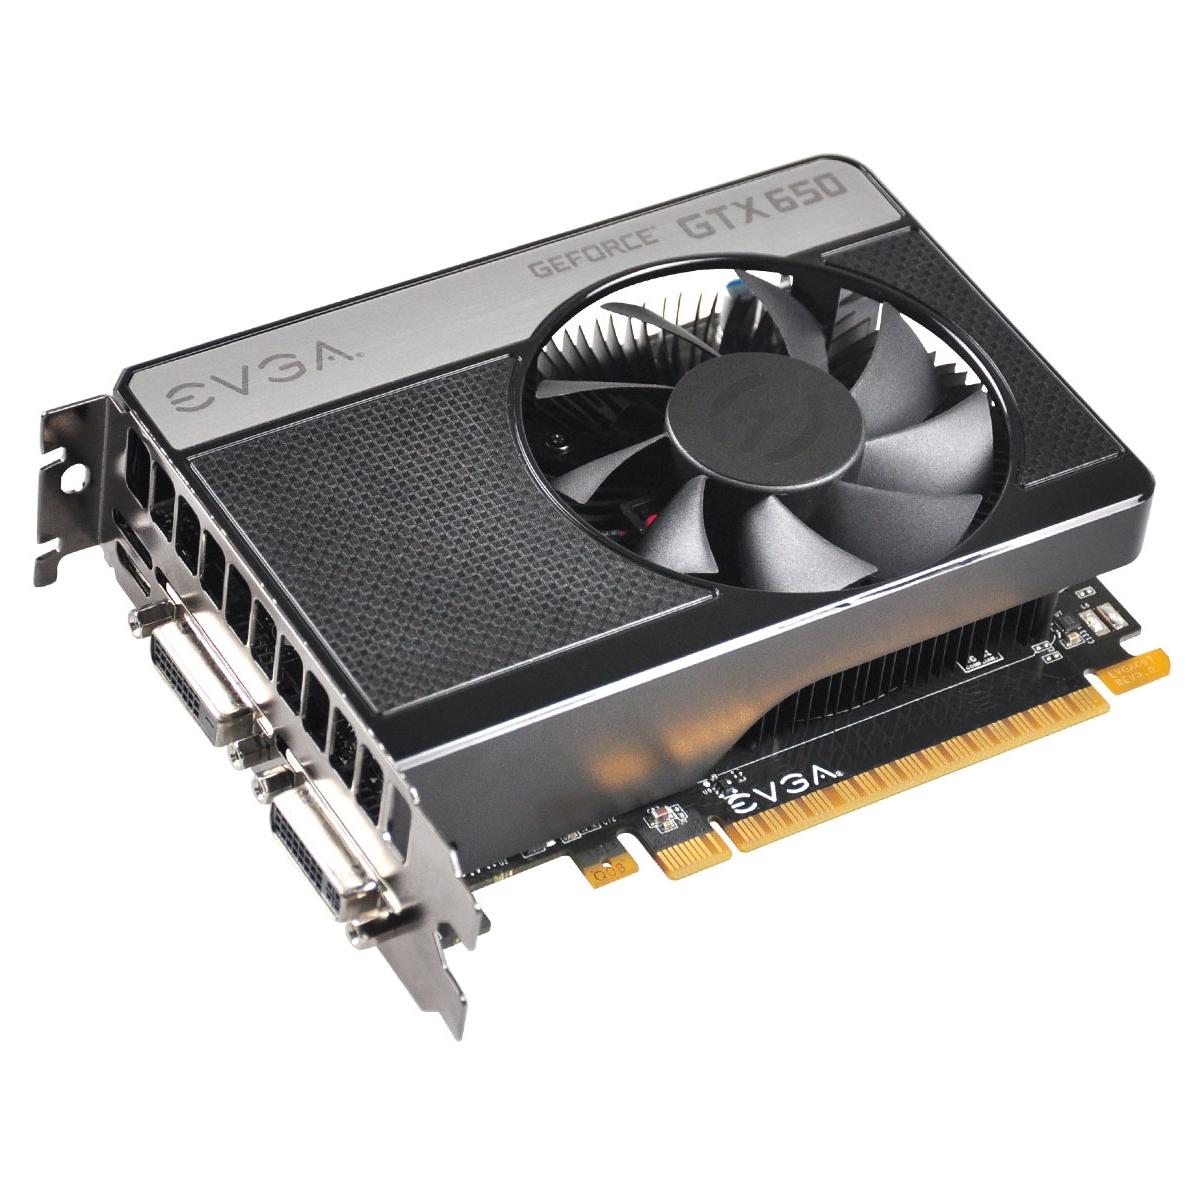 GeForce GTX 650 Graphic Card - 1202 MHz Core - 1 GB GDDR5 SDRAM - PCI Express 3.0 x16 - 5000 MHz Memory Clock - 2560 x 1600 - Fan Cooler - DirectX 11.0 DirectCompute 5.0 OpenGL 4.2 OpenCL - HDMI - DVI